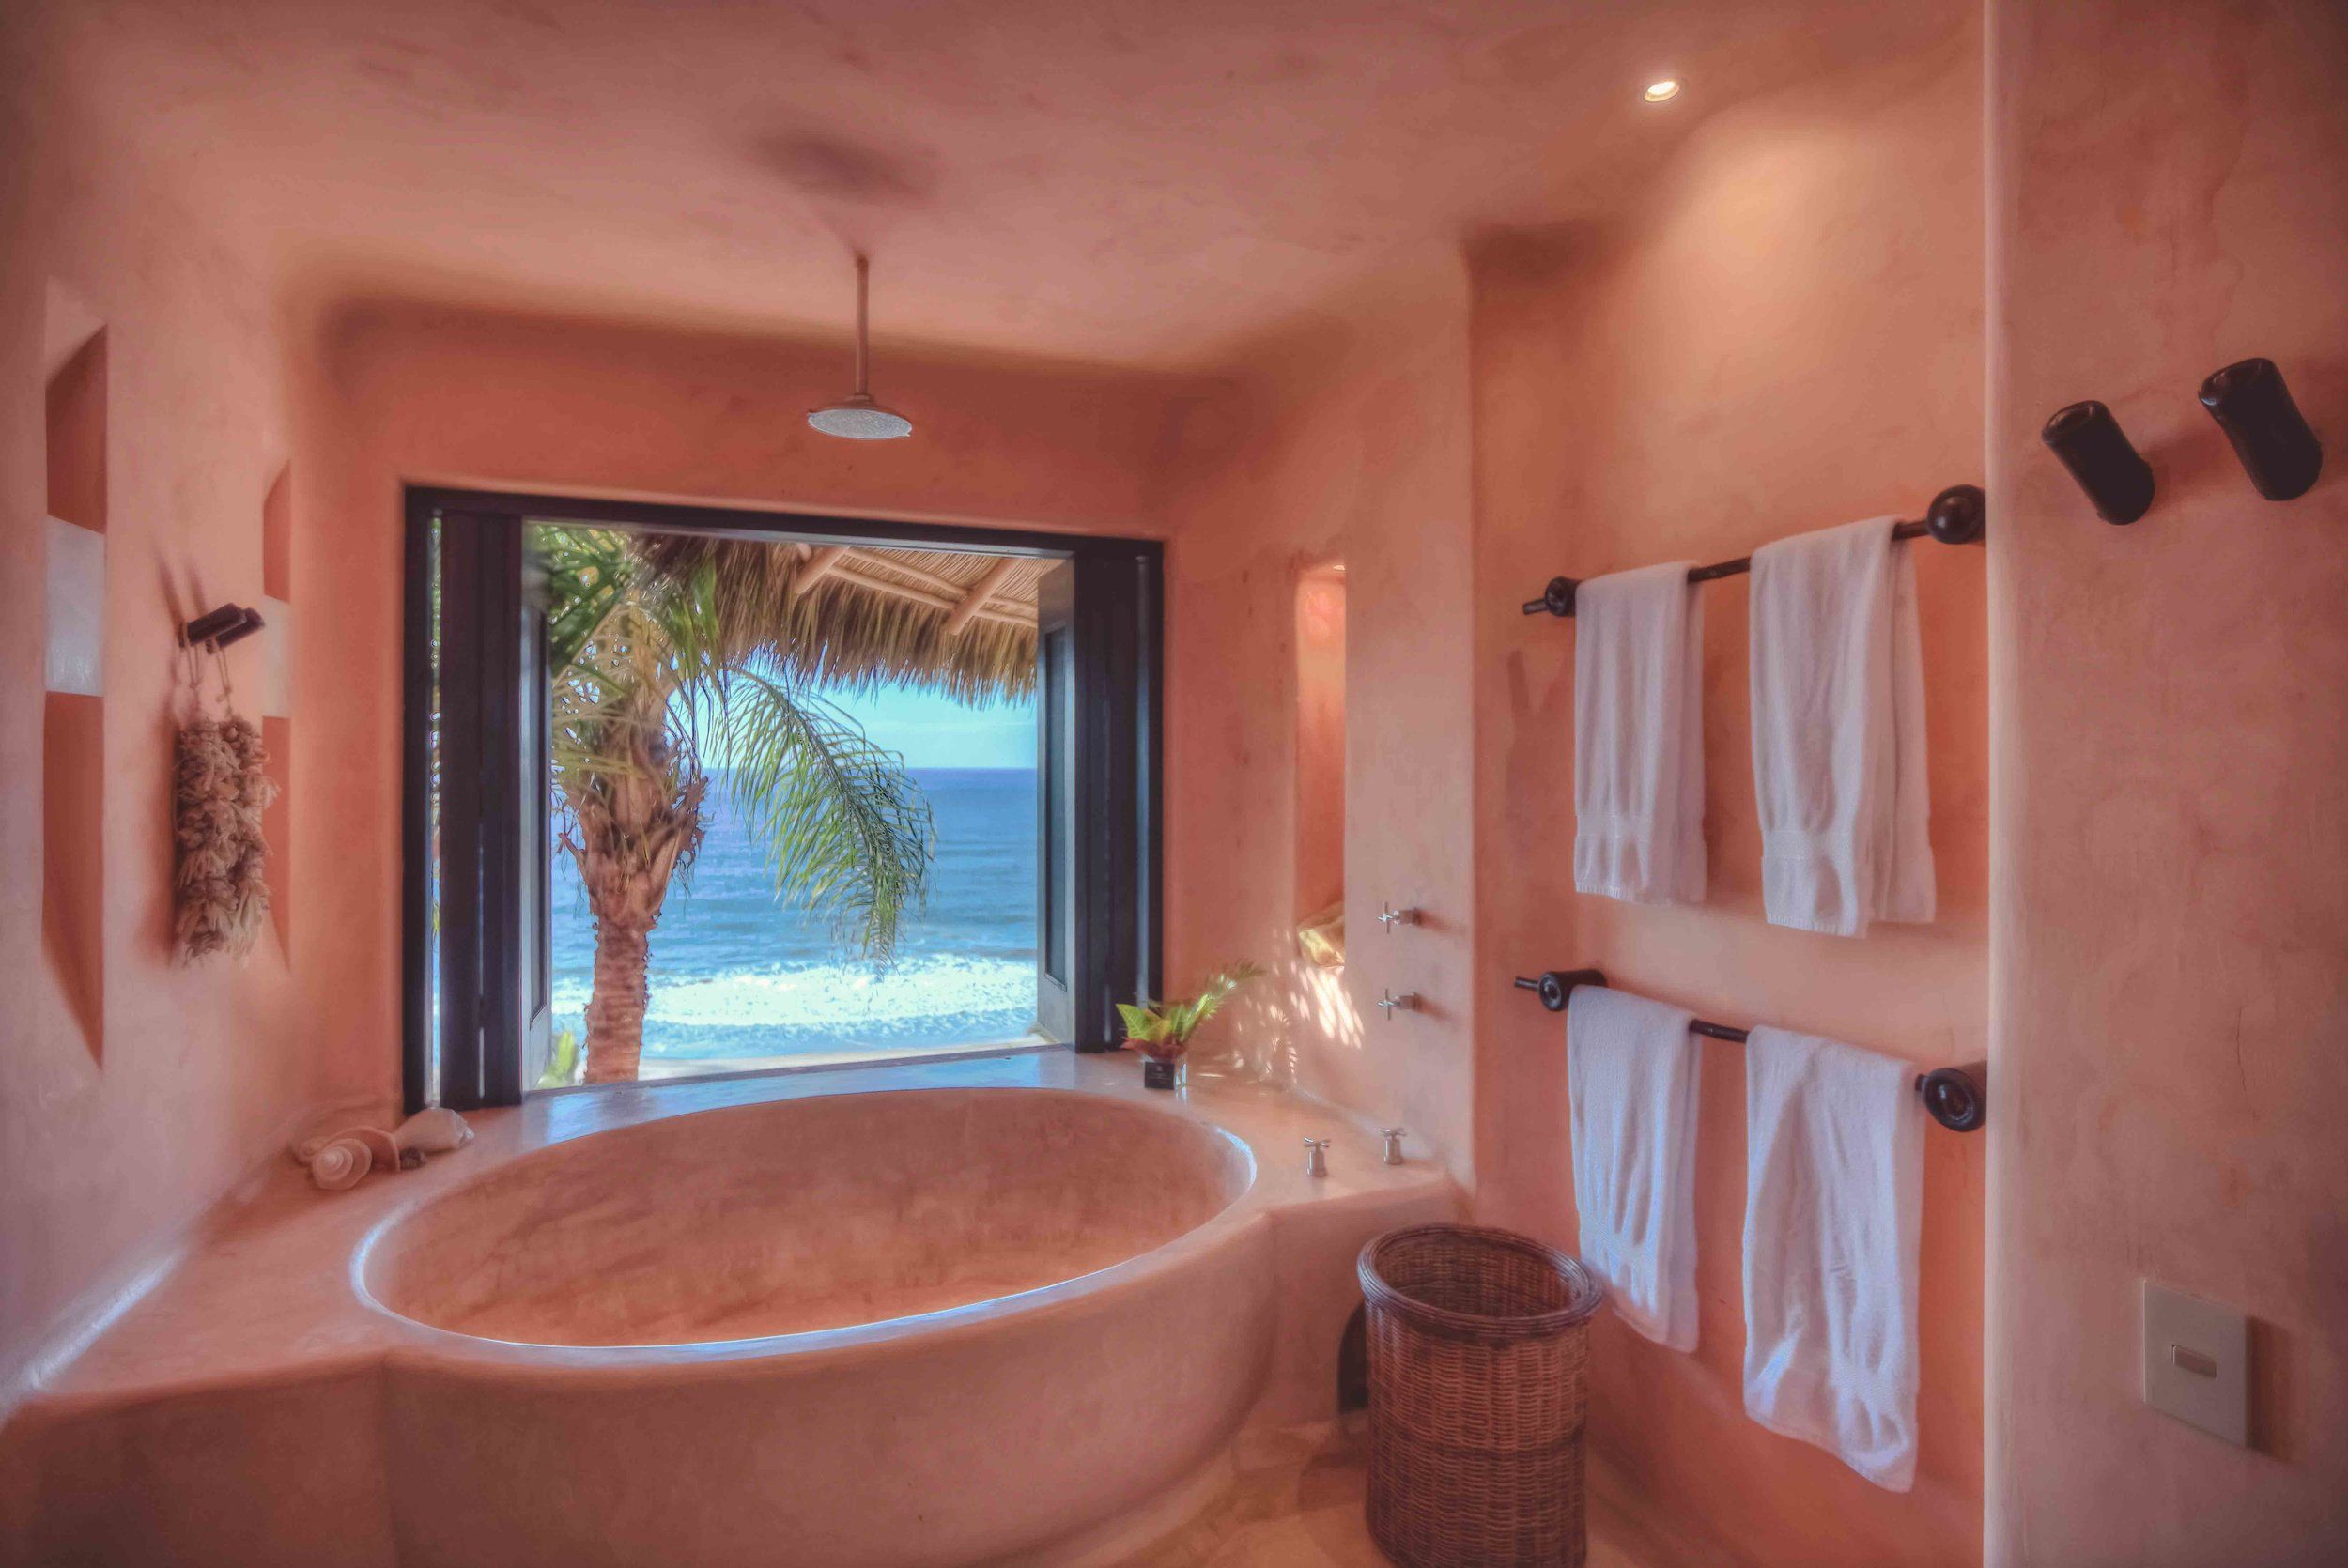 Luxury-Villa-Rental-Mexico-17.jpg